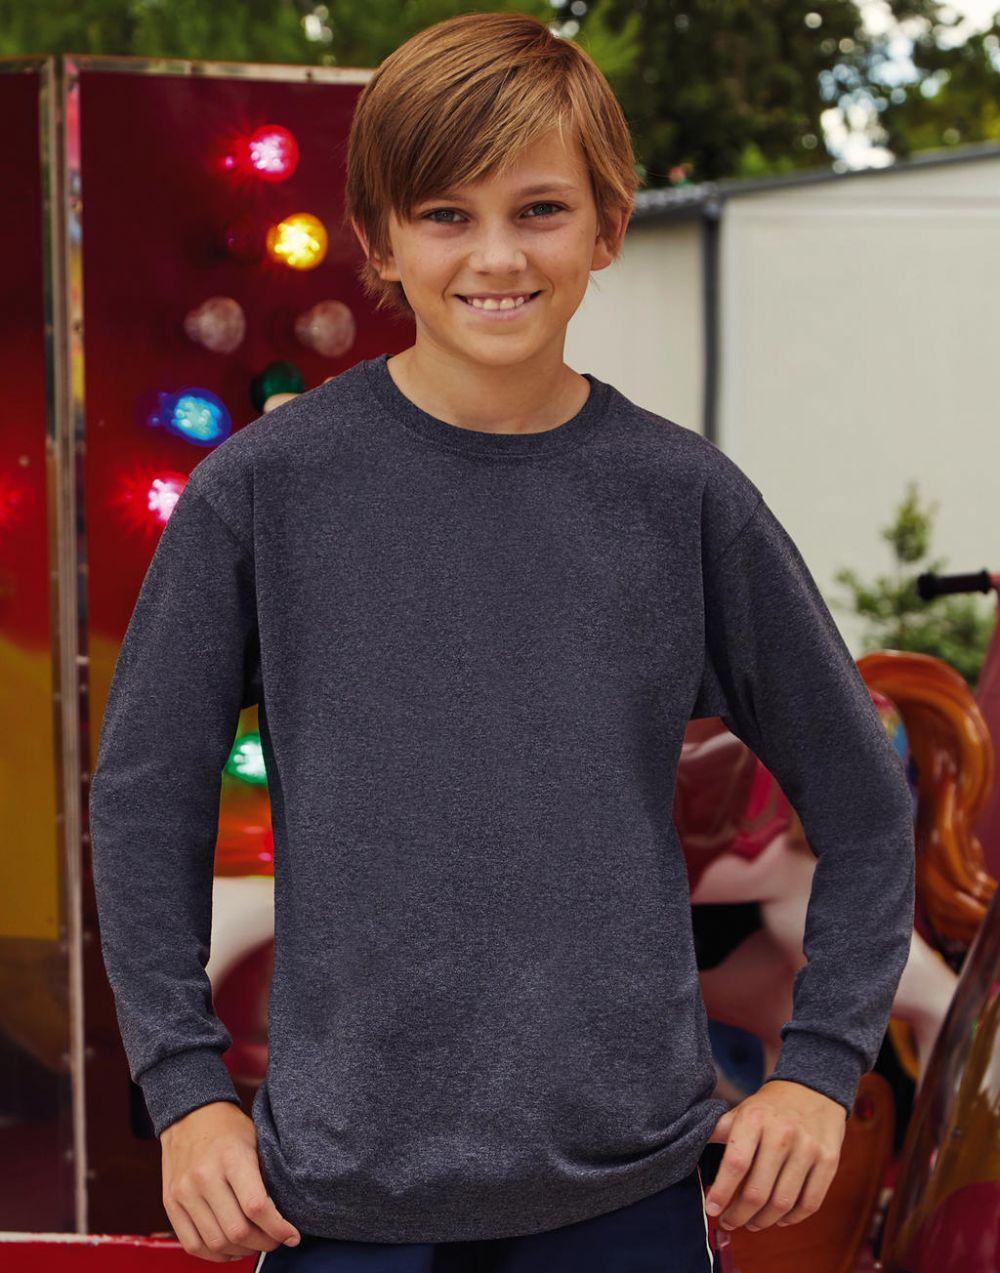 Camisetas personalizadas fruit of the loom valueweight manga larga niño vista 1